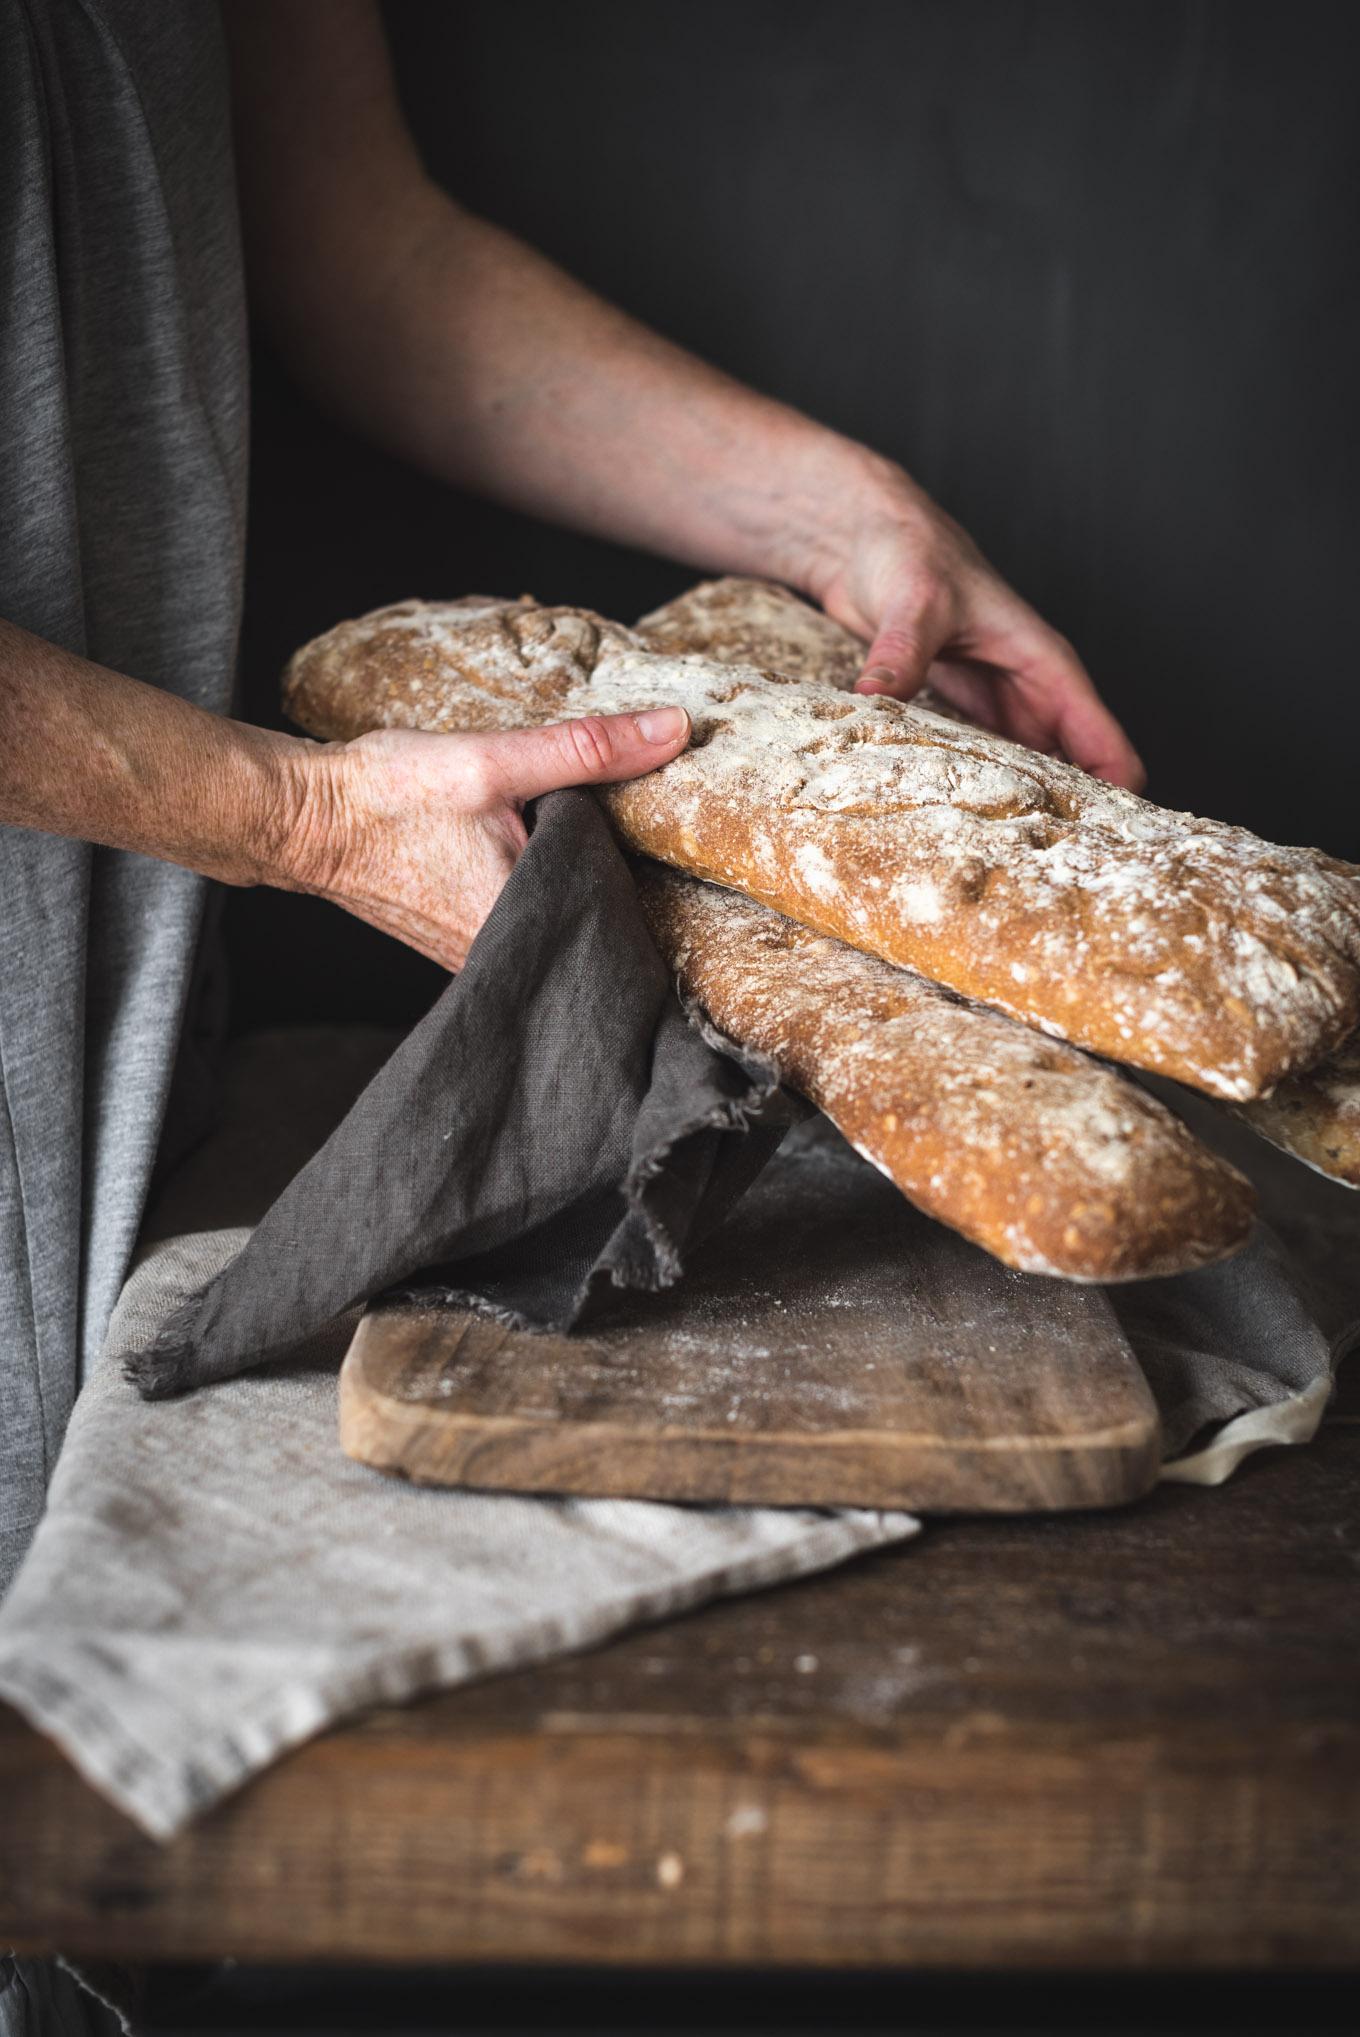 Receta paso a paso del pan de chapata